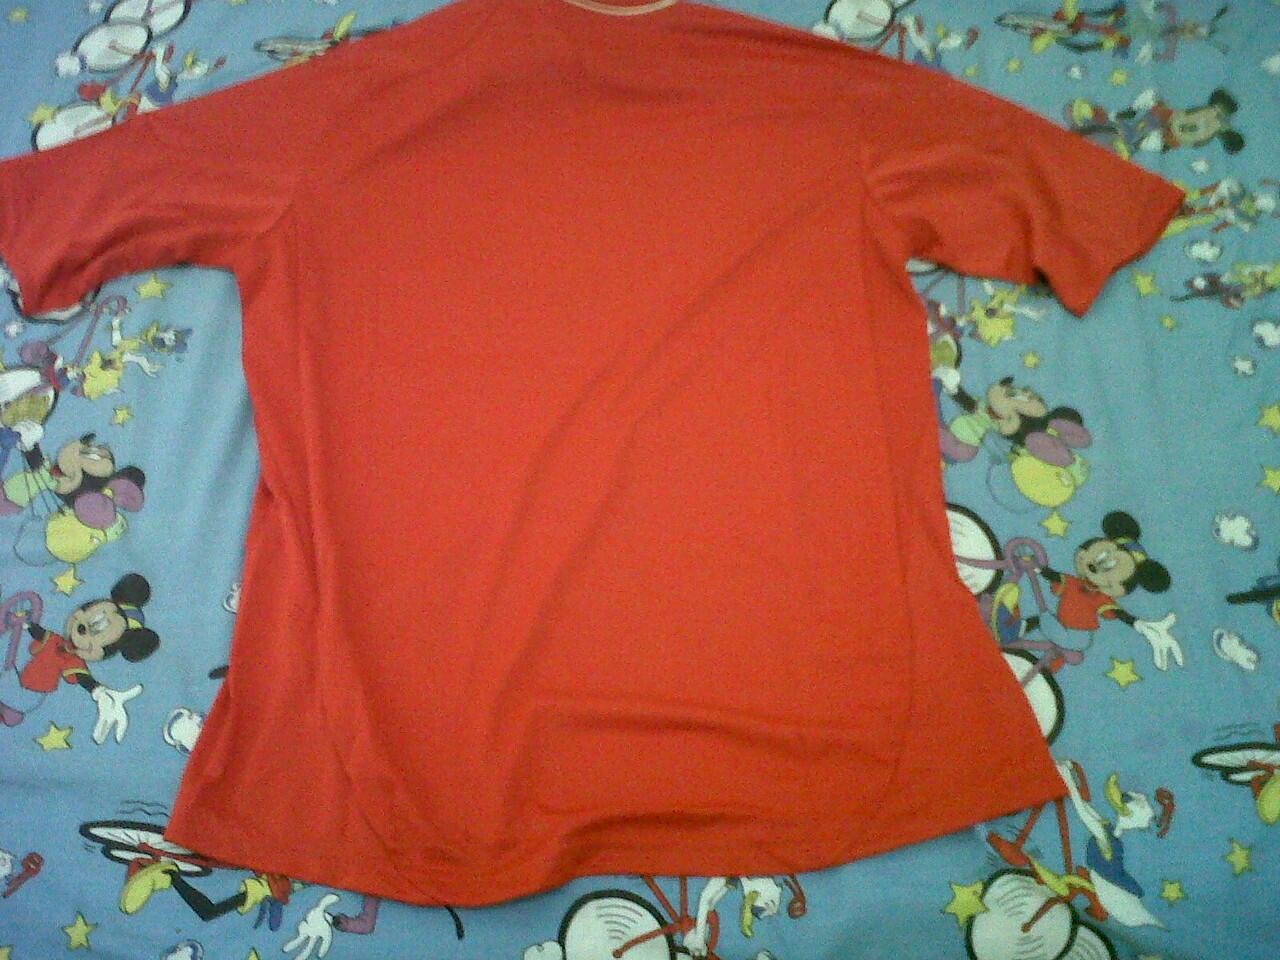 jual cepat original jersey russia home 12/13 size s bnwt 200k only freeongkir